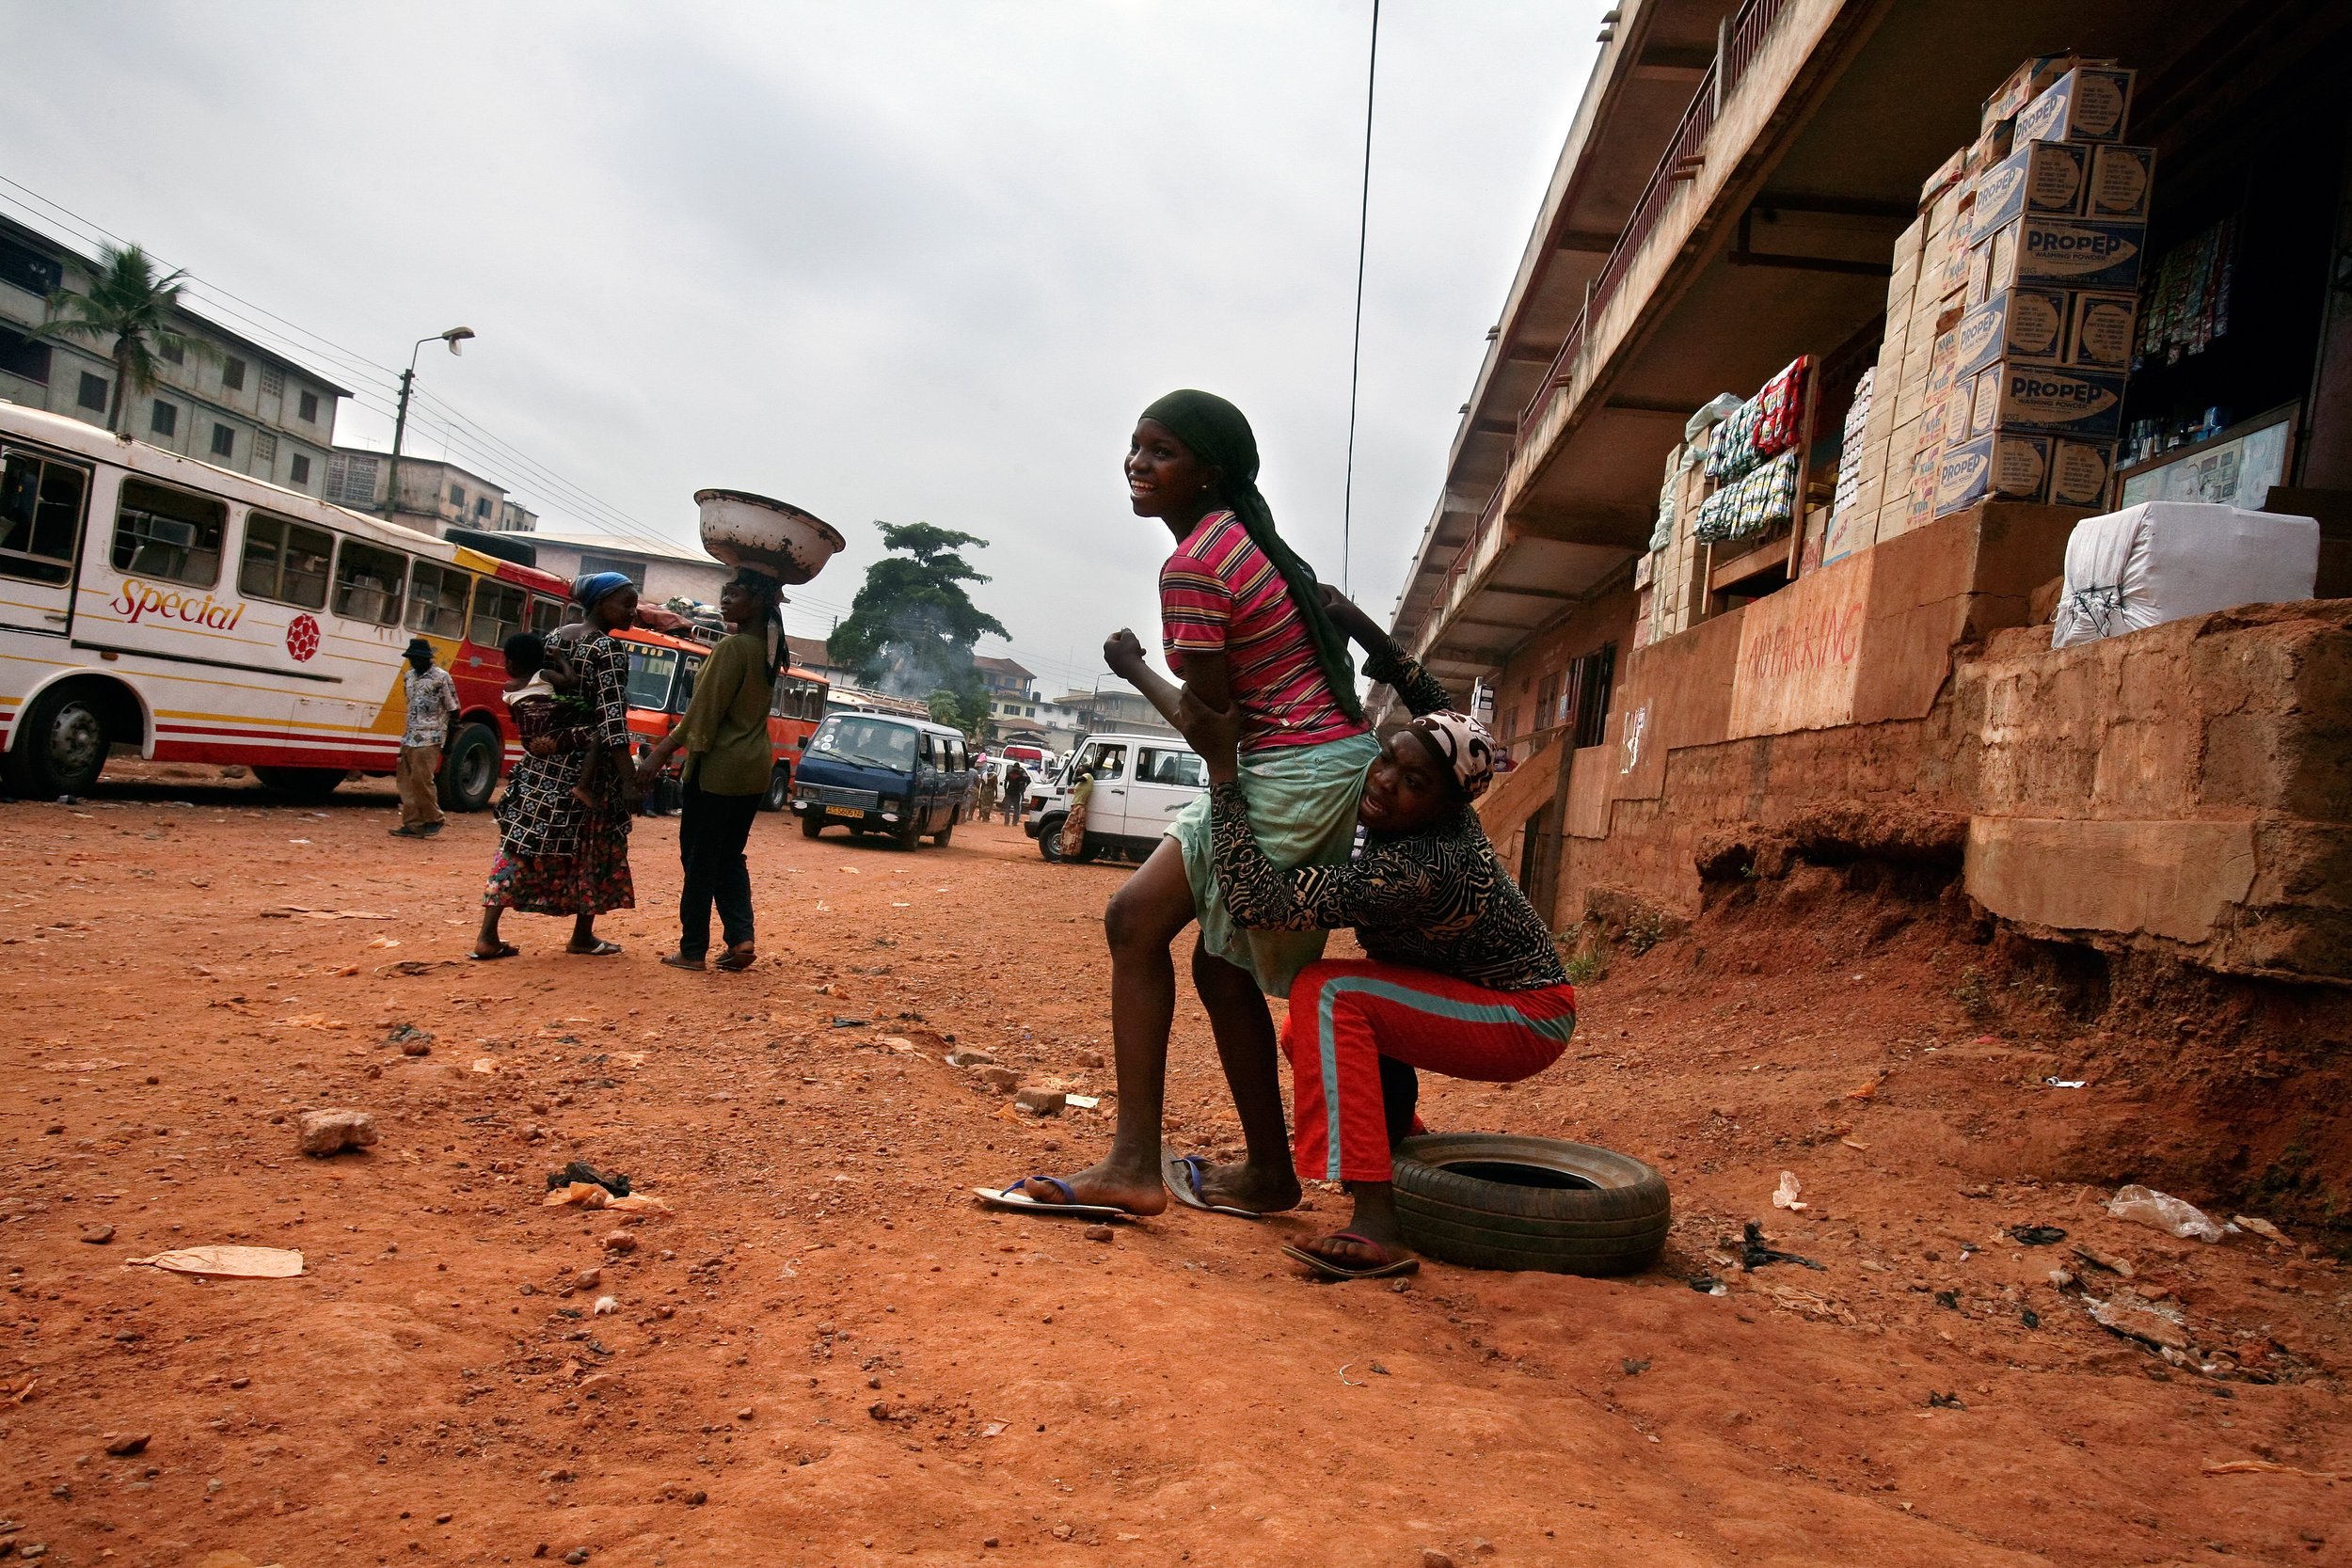 Teenage Kayayo girls rush to their feet to chase after a bus entering Doctor Mensah Market in Kumasi, Ghana, Feb. 26, 2009.